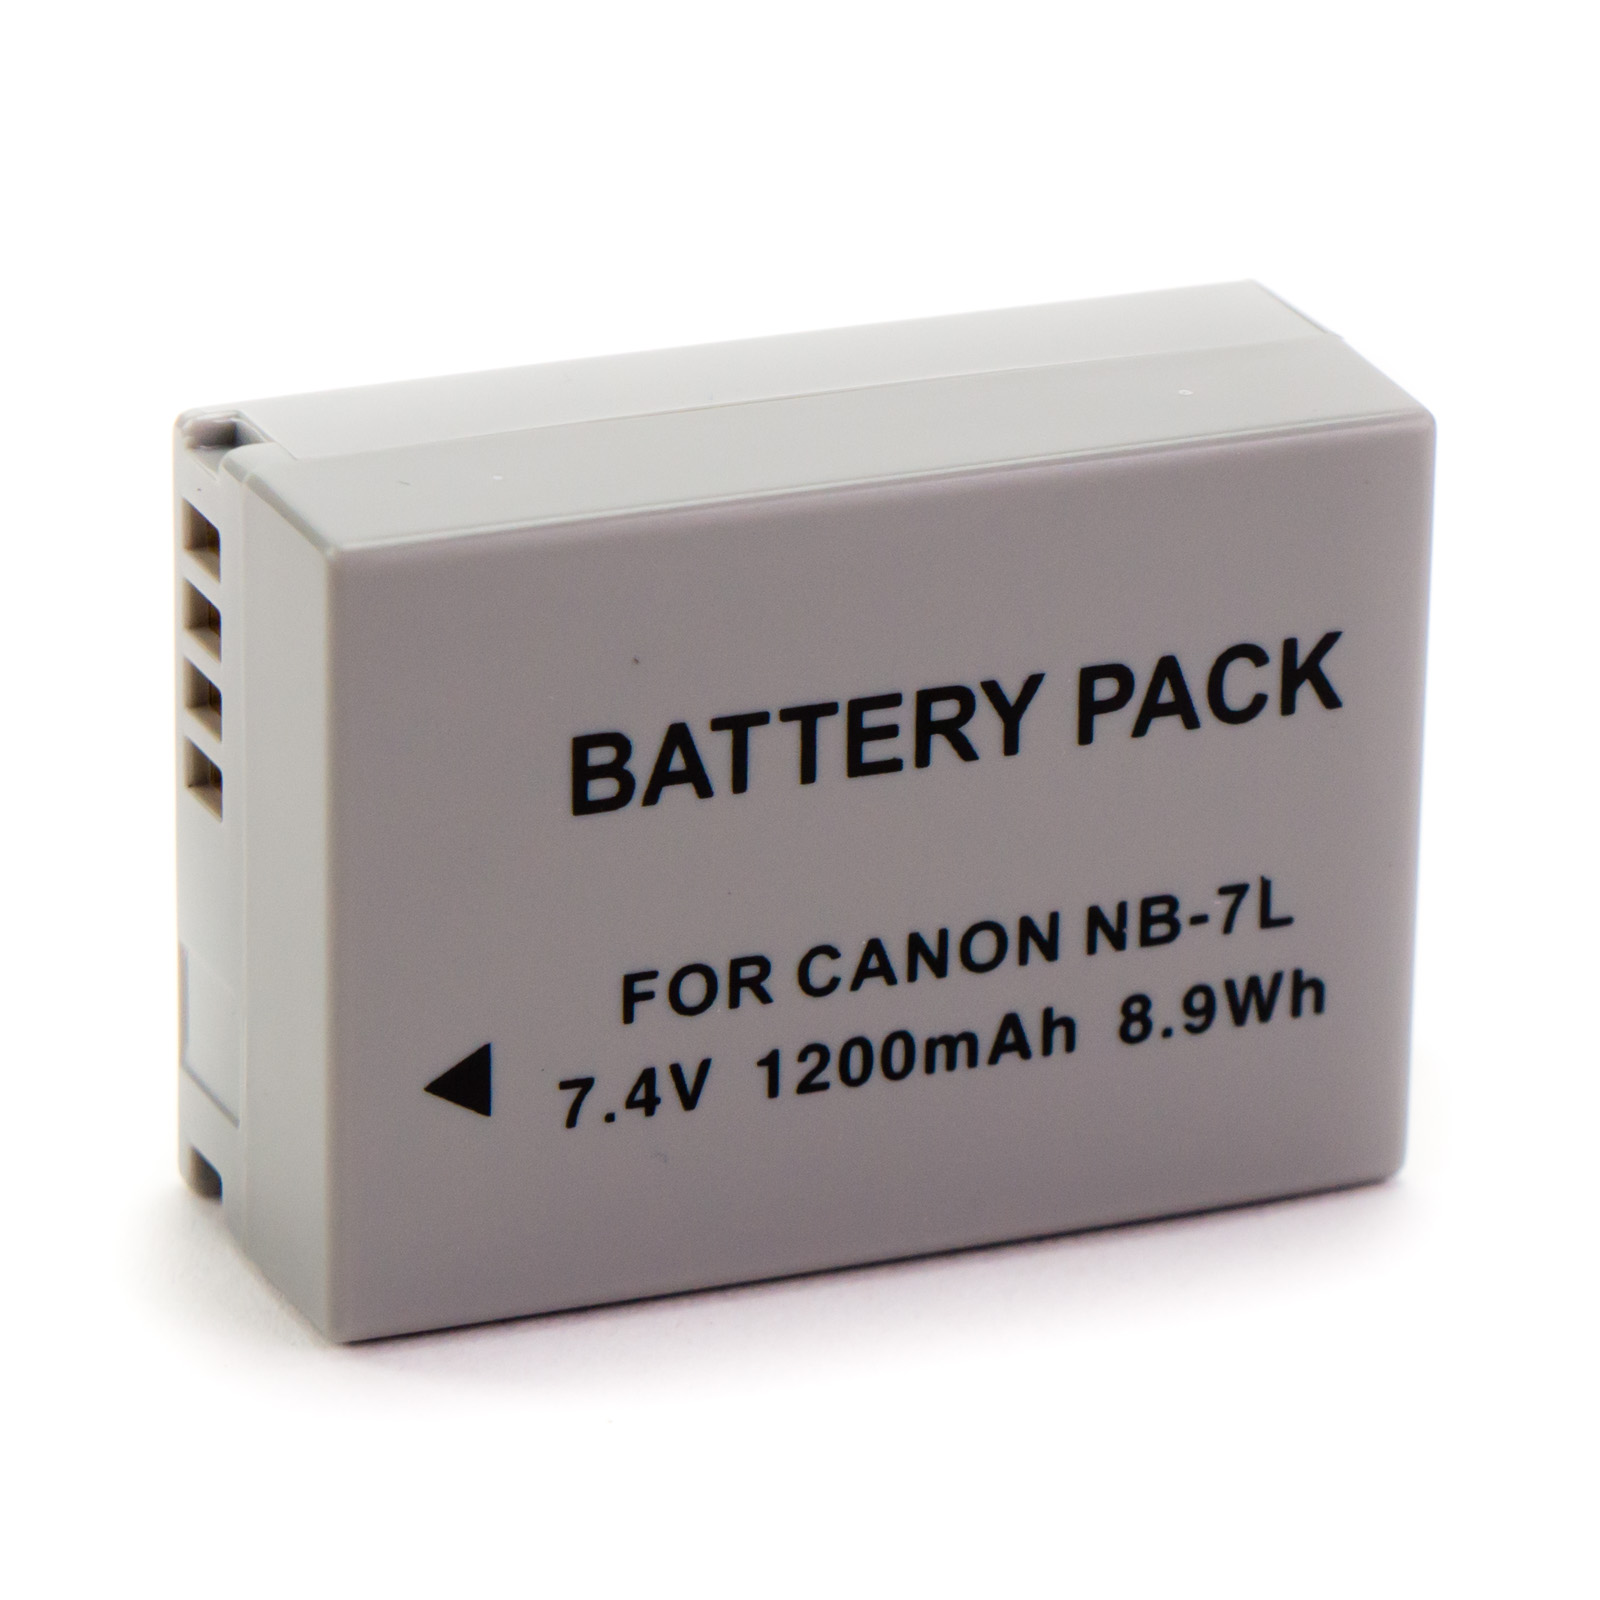 Bateria NB-7L 1200mAh para câmera digital e filmadora Canon Powershot G10